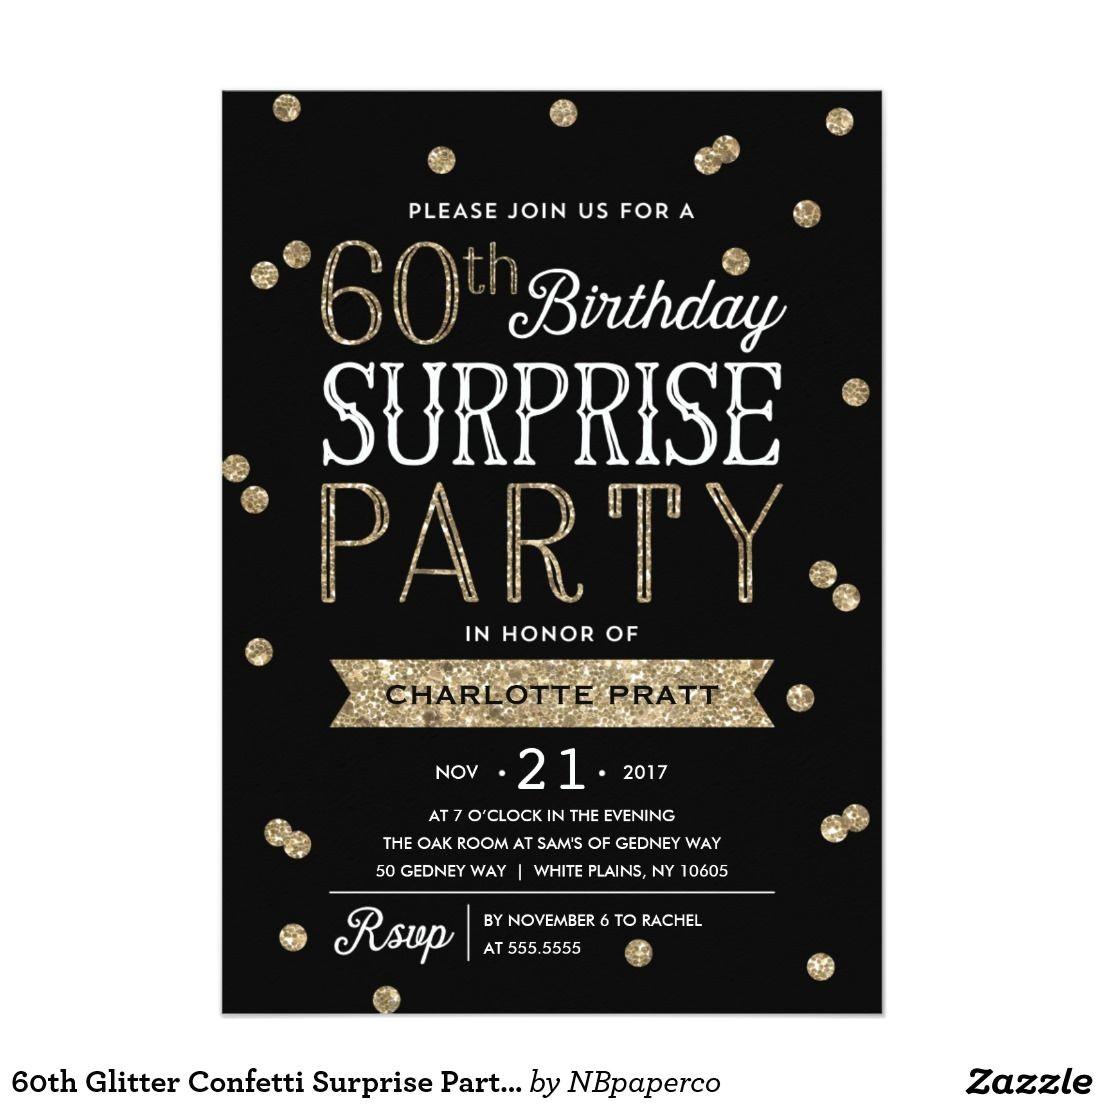 Surprise 60th Birthday Invitation Wording Ideas 60th Glitter Confetti Surprise Party Invitation Surprise